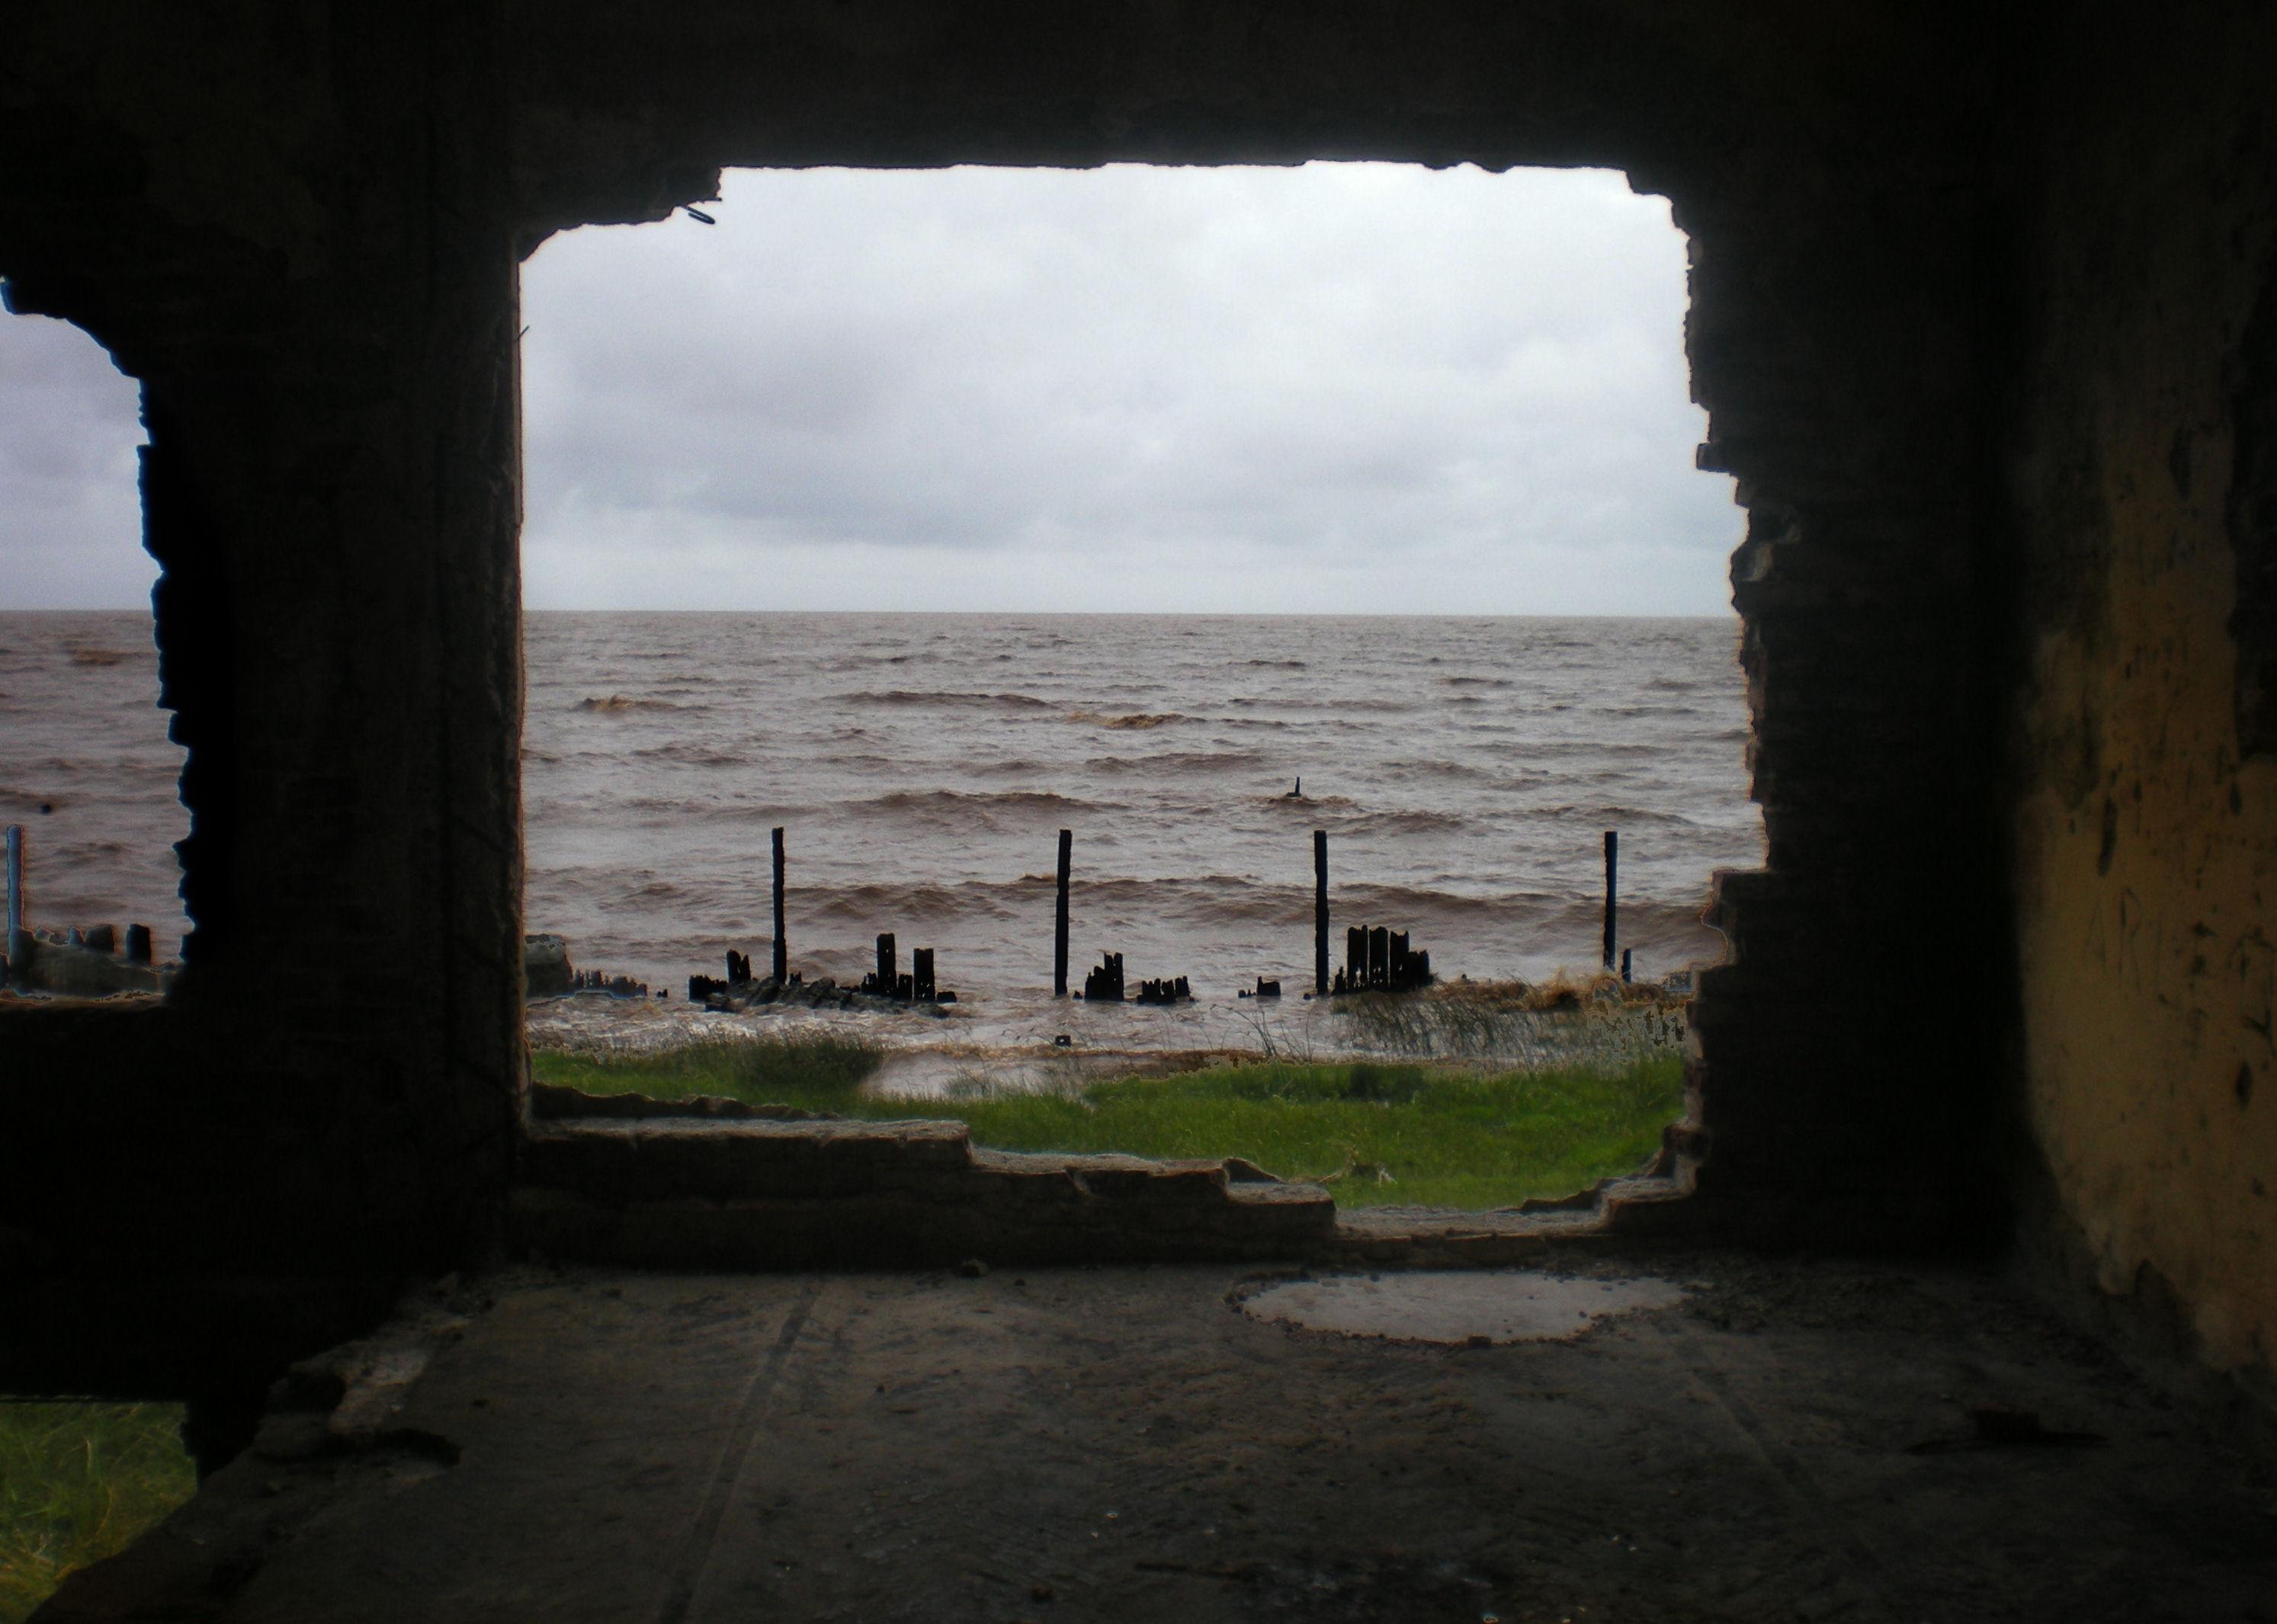 vista ventana hotel argentino